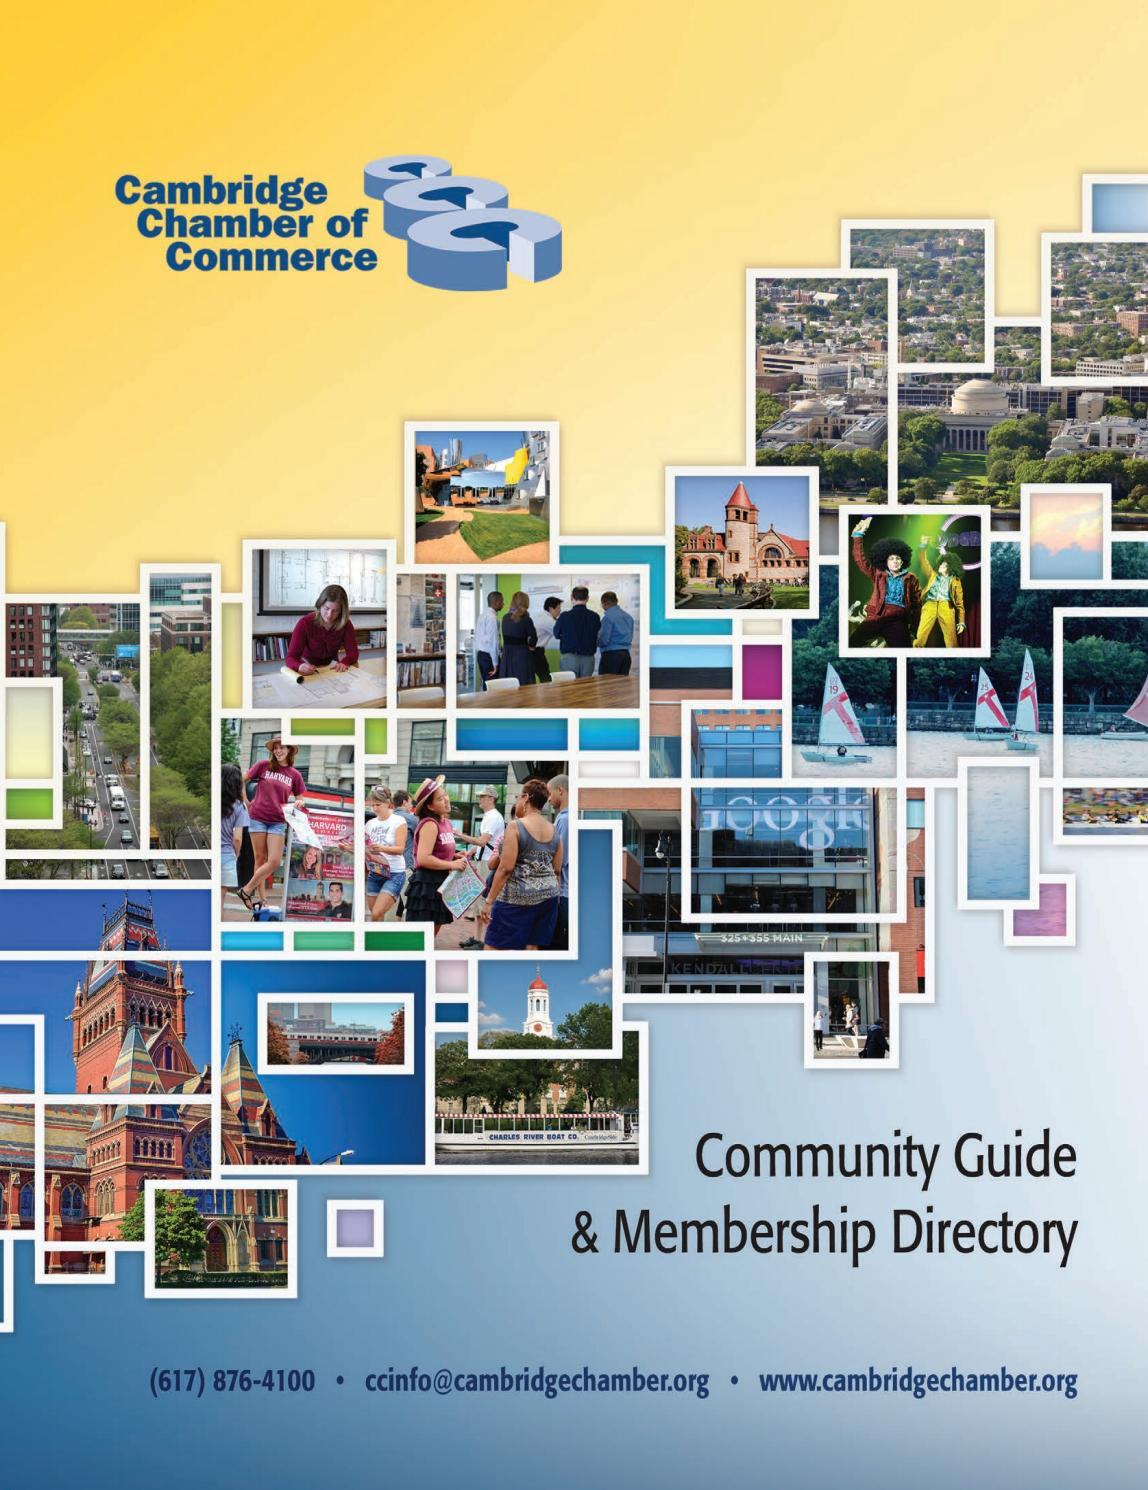 Cambridge Community Guide & Membership Directory by Atlantic Communications  Group, Inc. - issuu